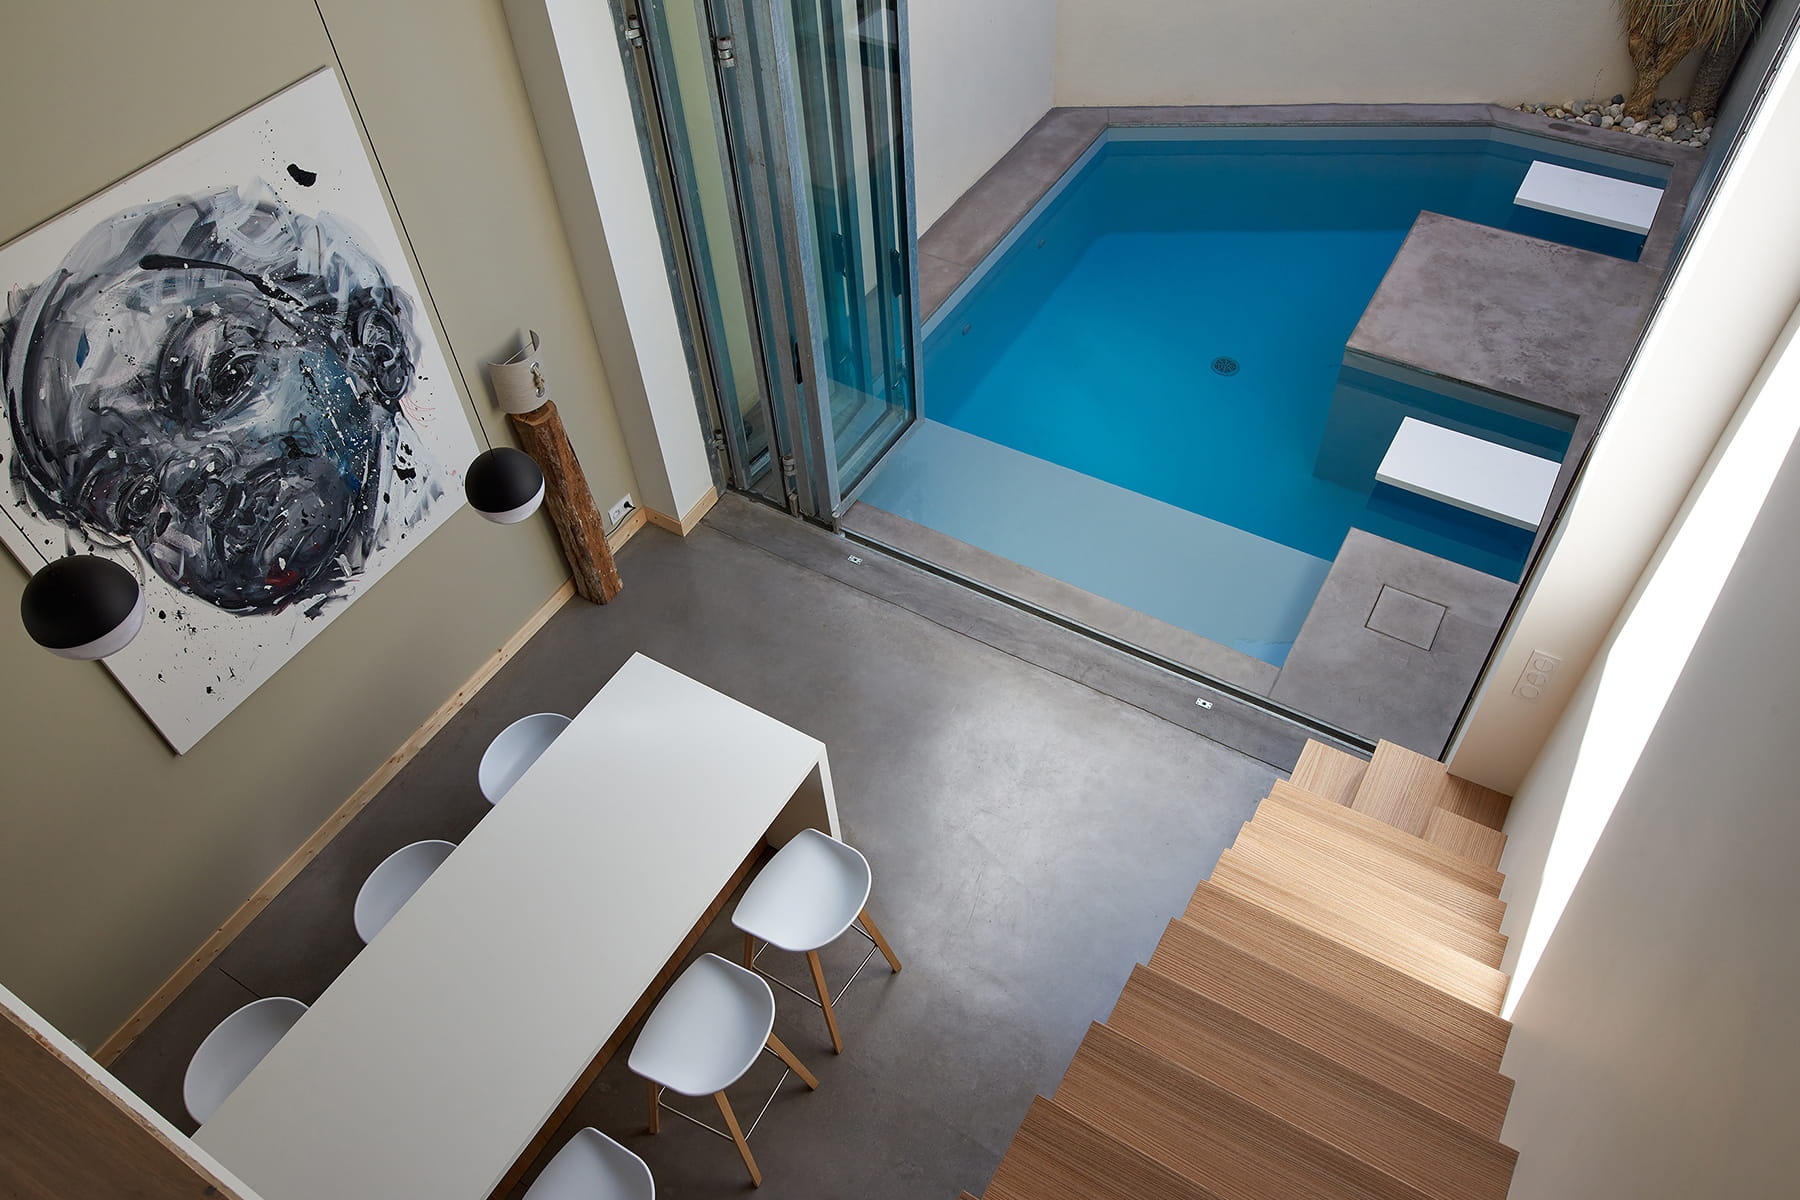 1000 images about mini piscine on pinterest coins belle and piscine hors sol. Black Bedroom Furniture Sets. Home Design Ideas